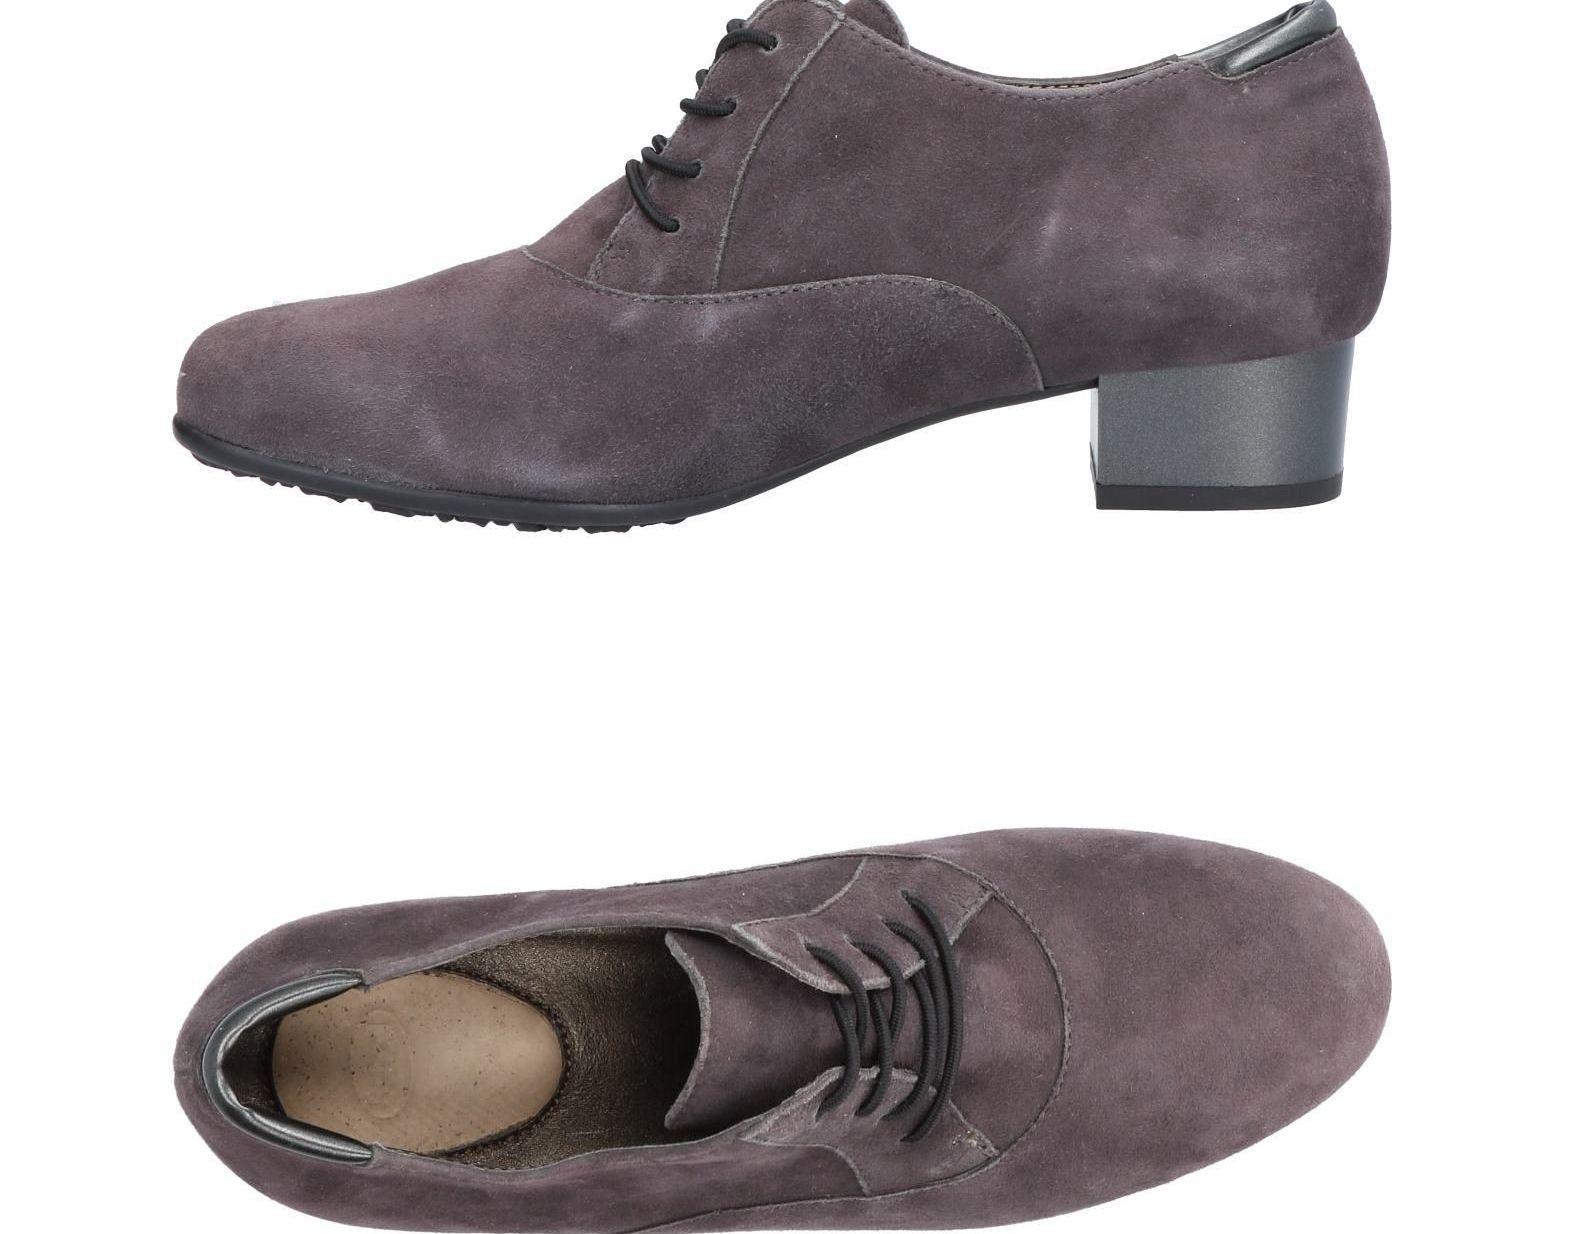 SCHOLL ΠΑΠΟΥΤΣΙΑ Παπούτσια με κορδόνια